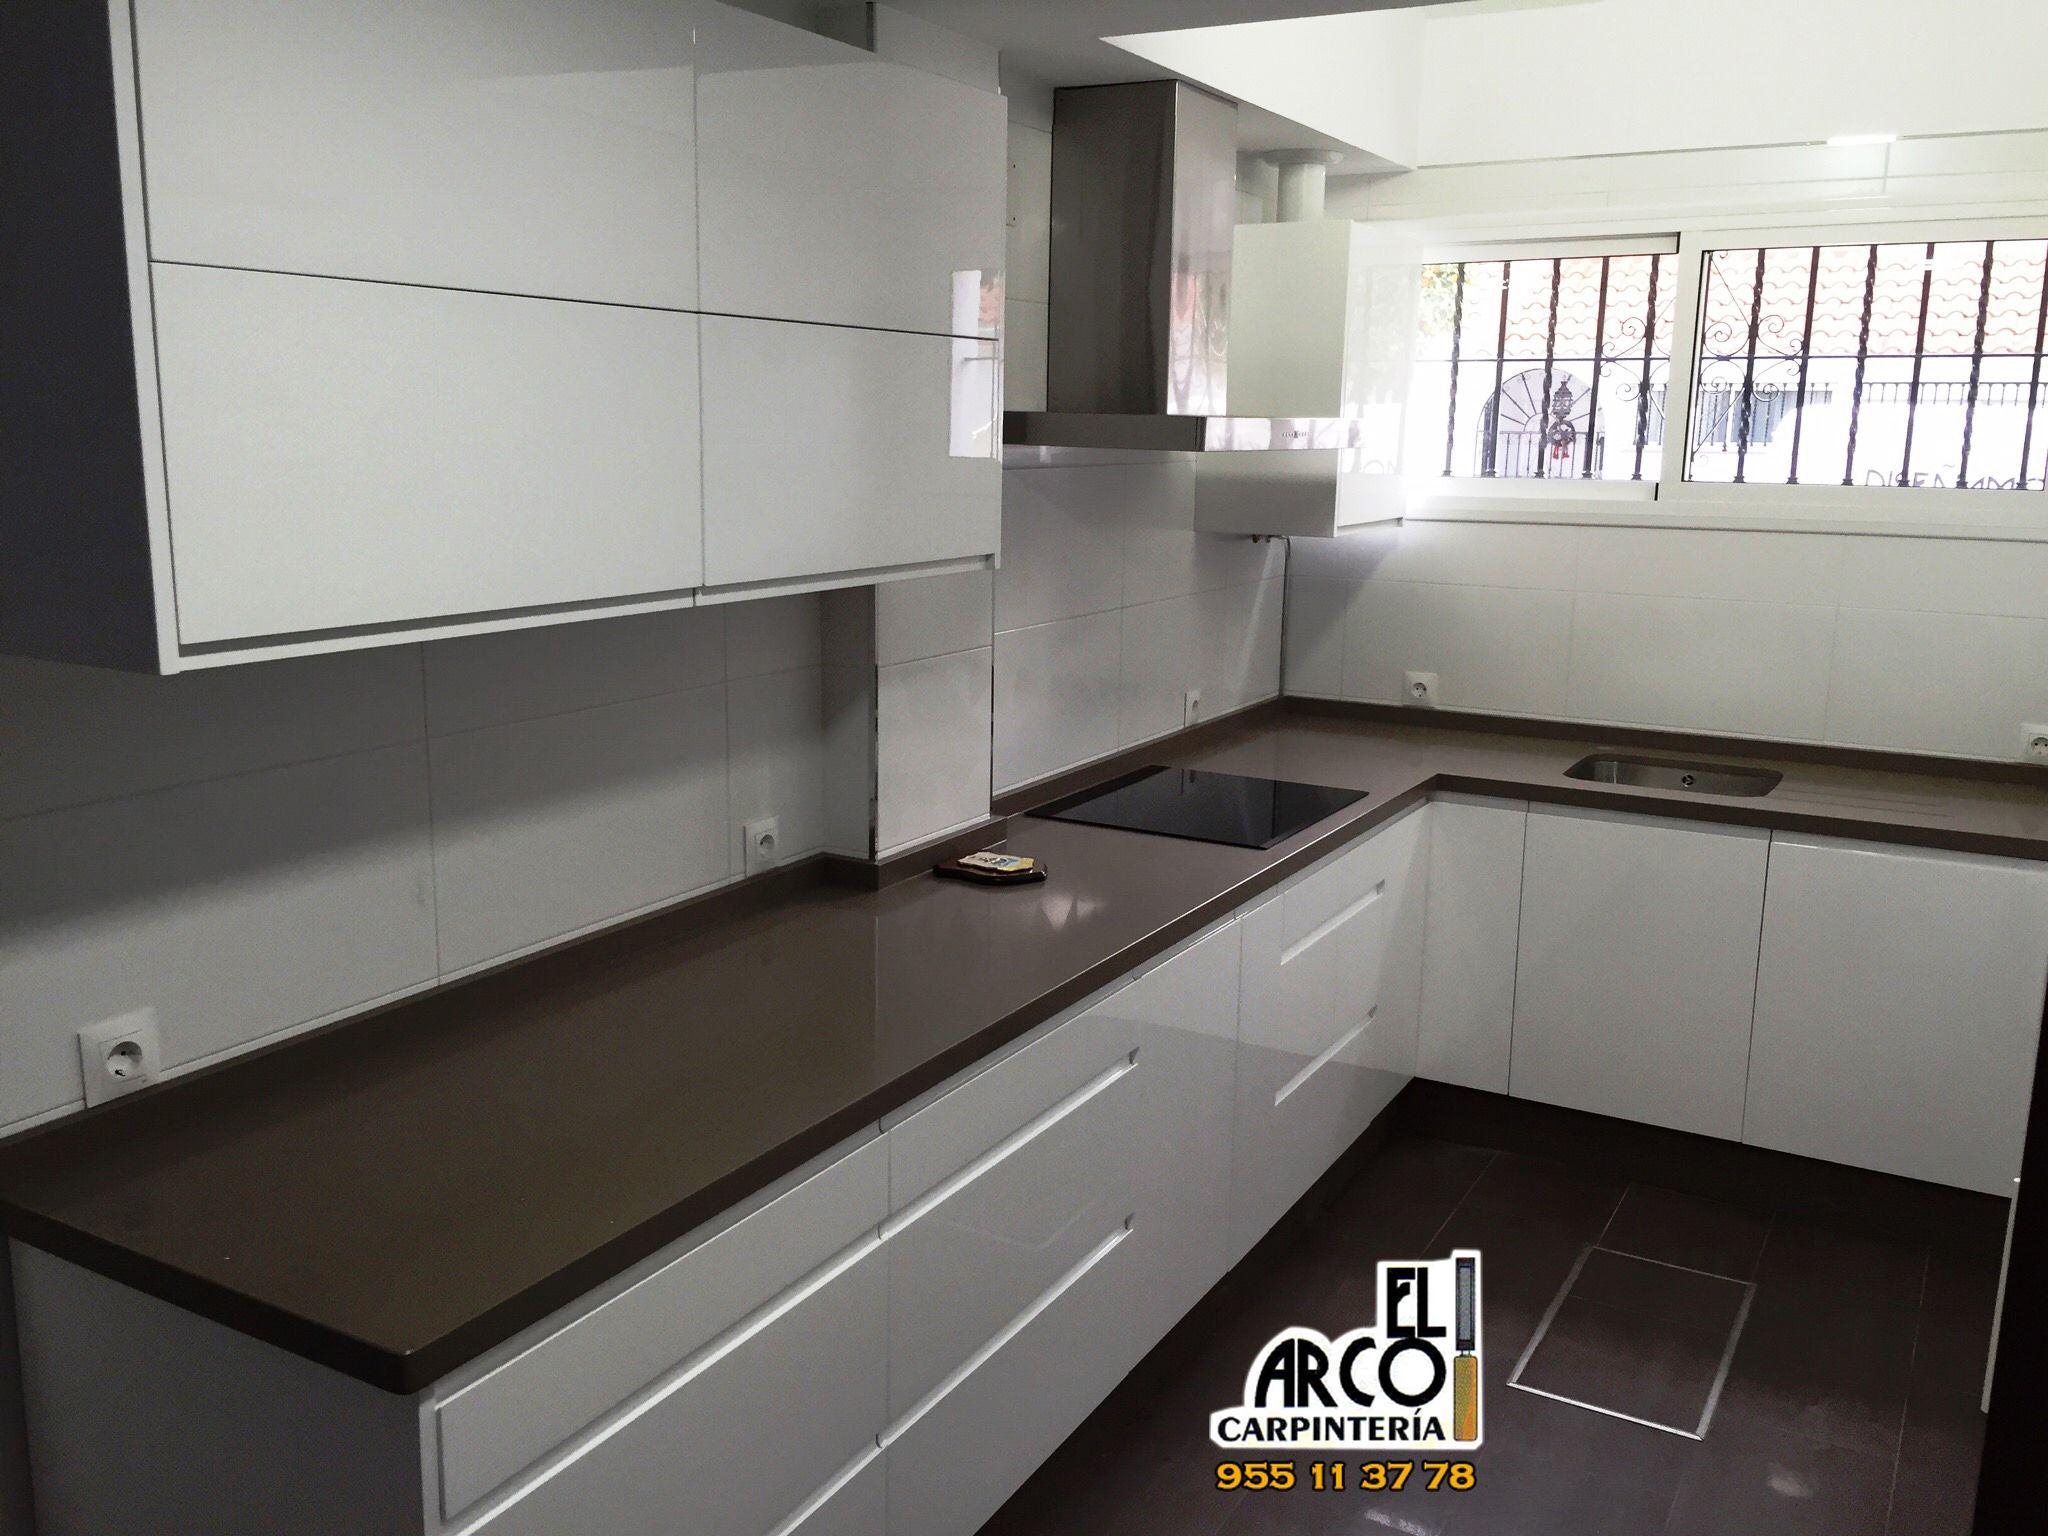 Cocina con puertas blanco alto brillo, con tirador integrado en ...